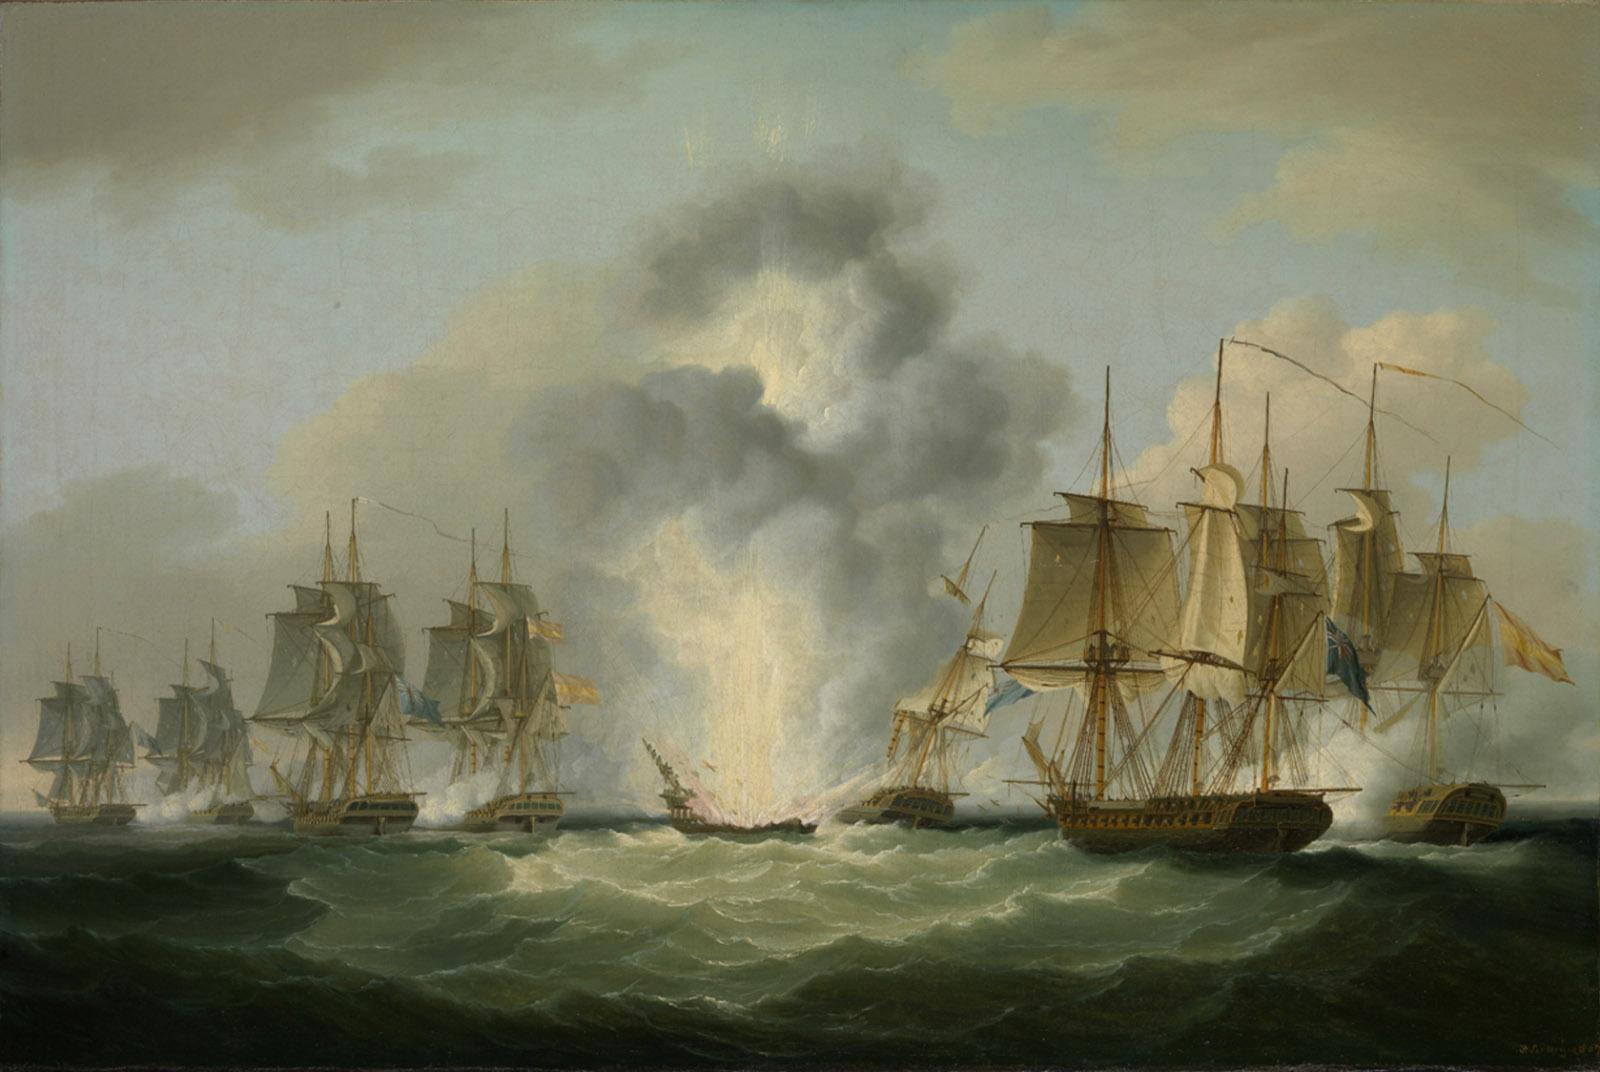 Painting of four British frigates capturing Spanish treasure ships off Cape Santa Maria, Portugal, 1804